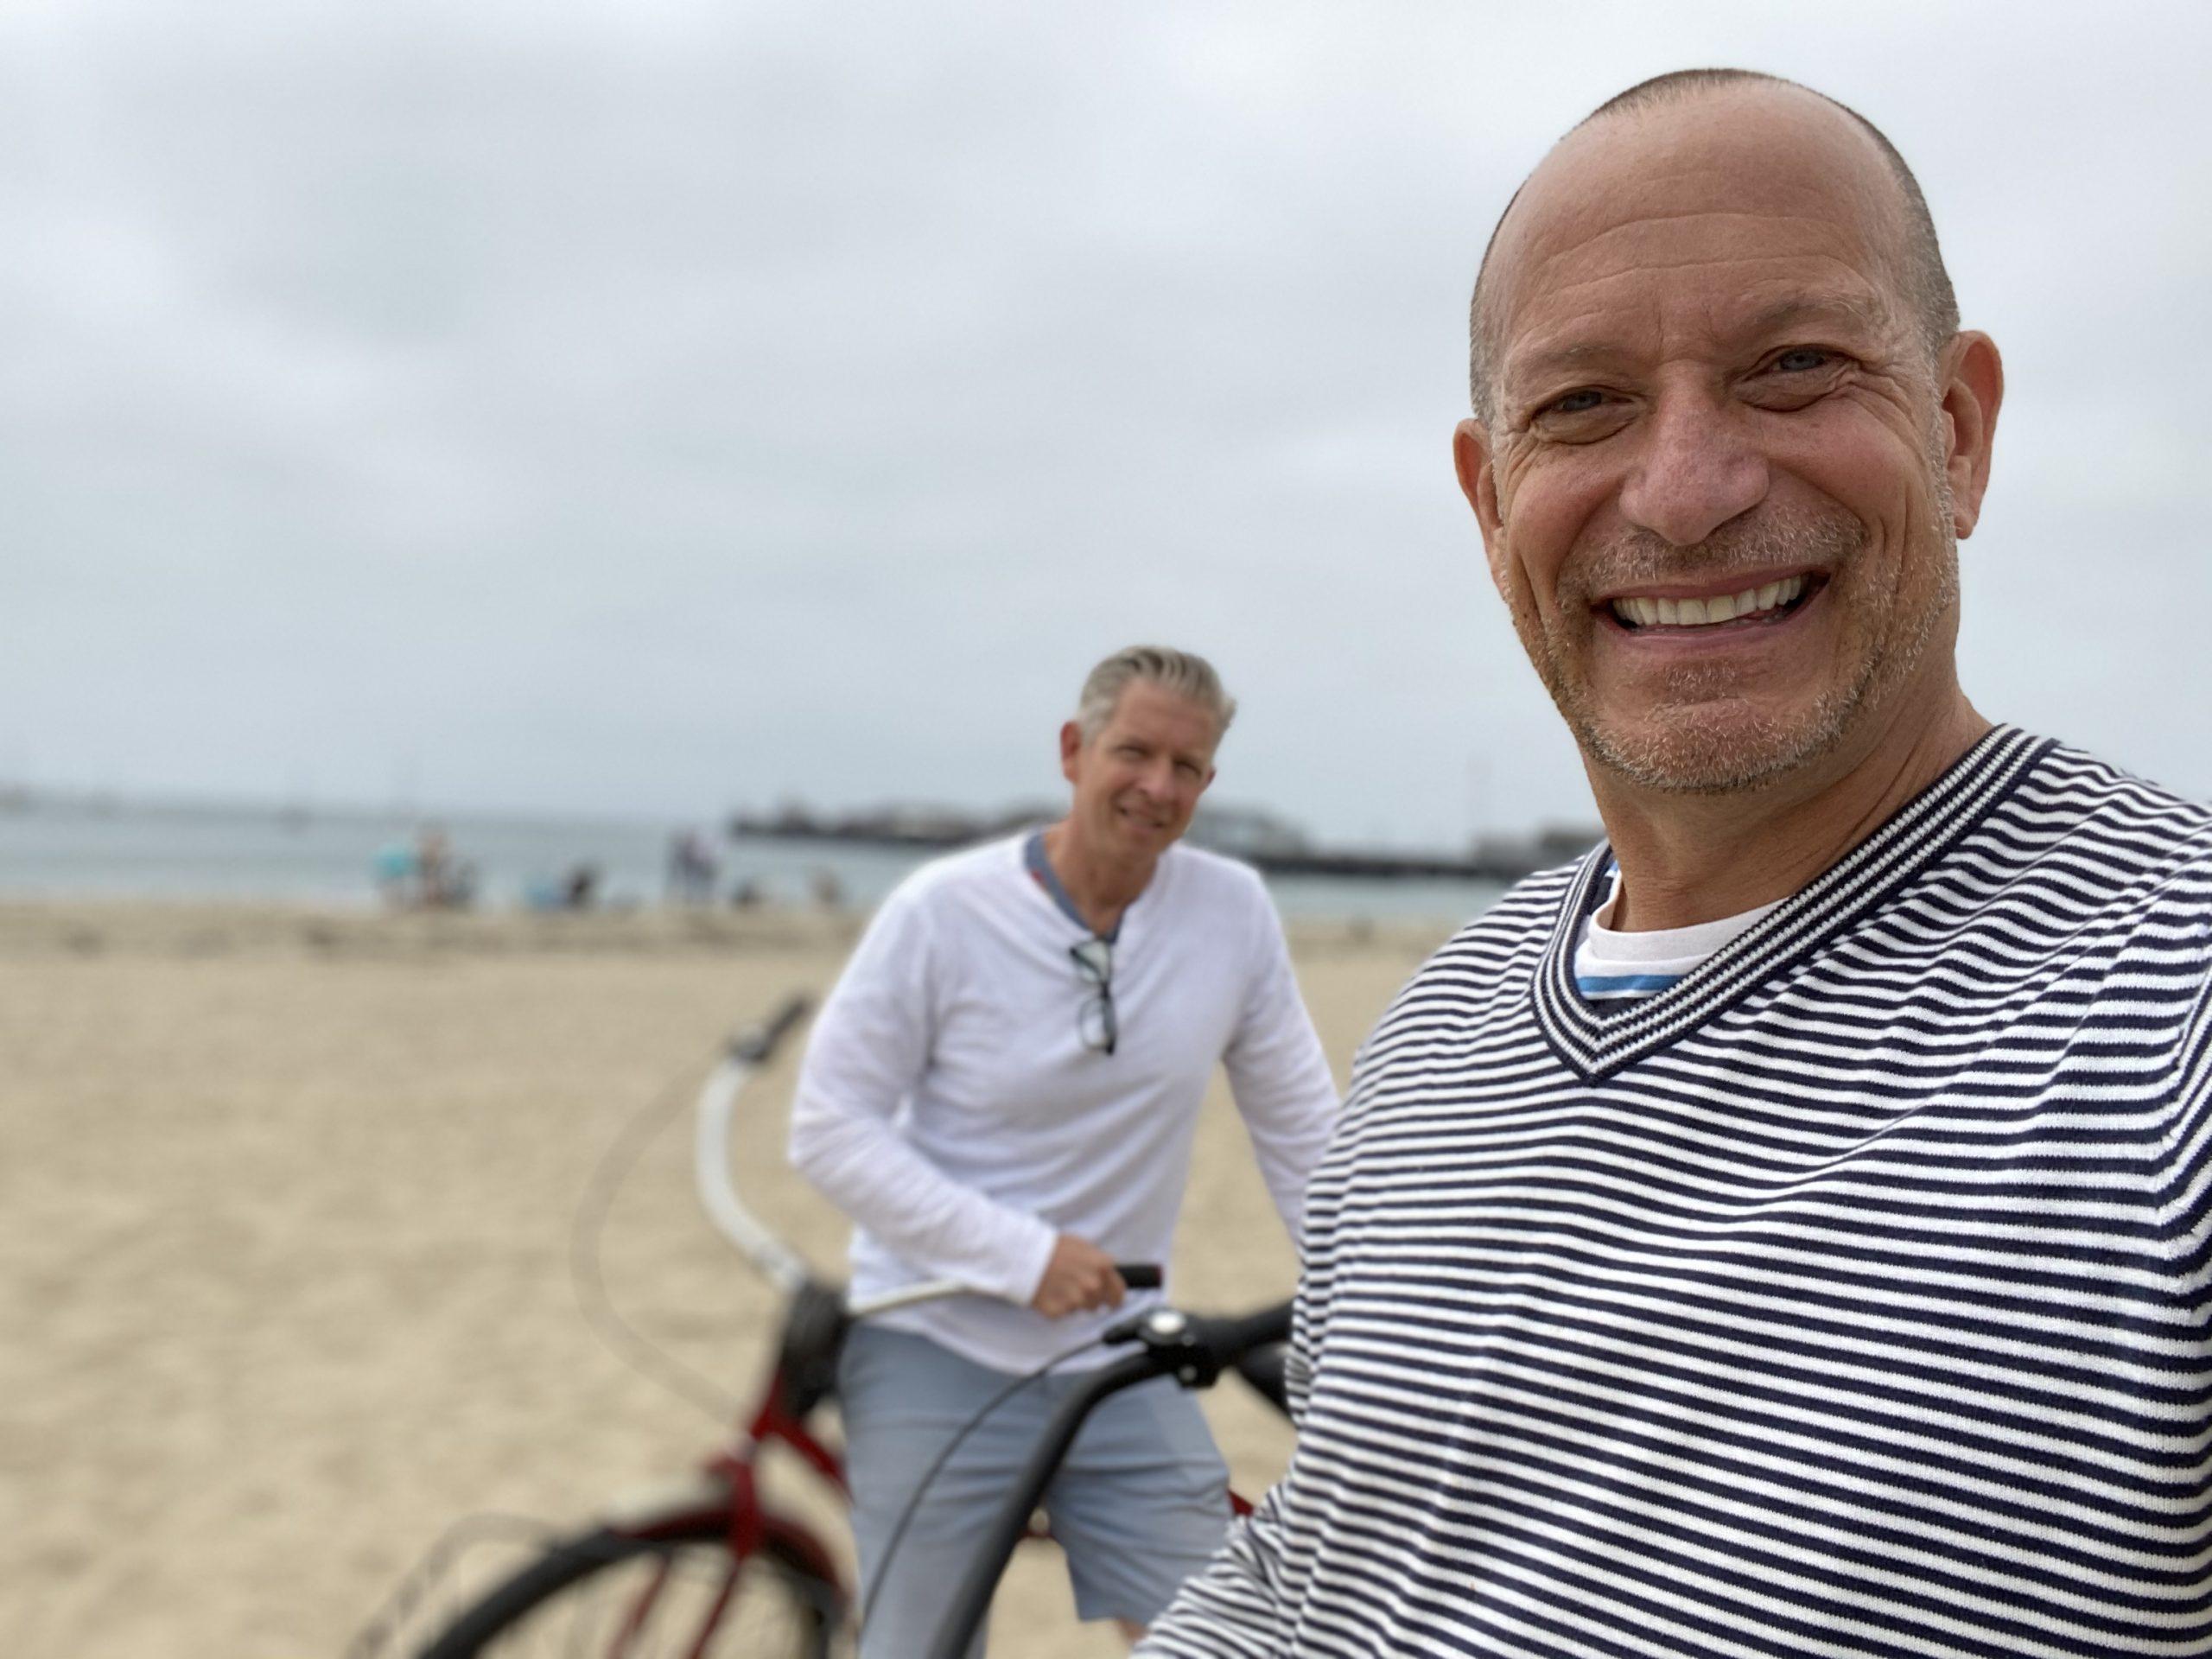 two men stop for photo while riding bikes along beachfront in downtown Santa Barbara, CA